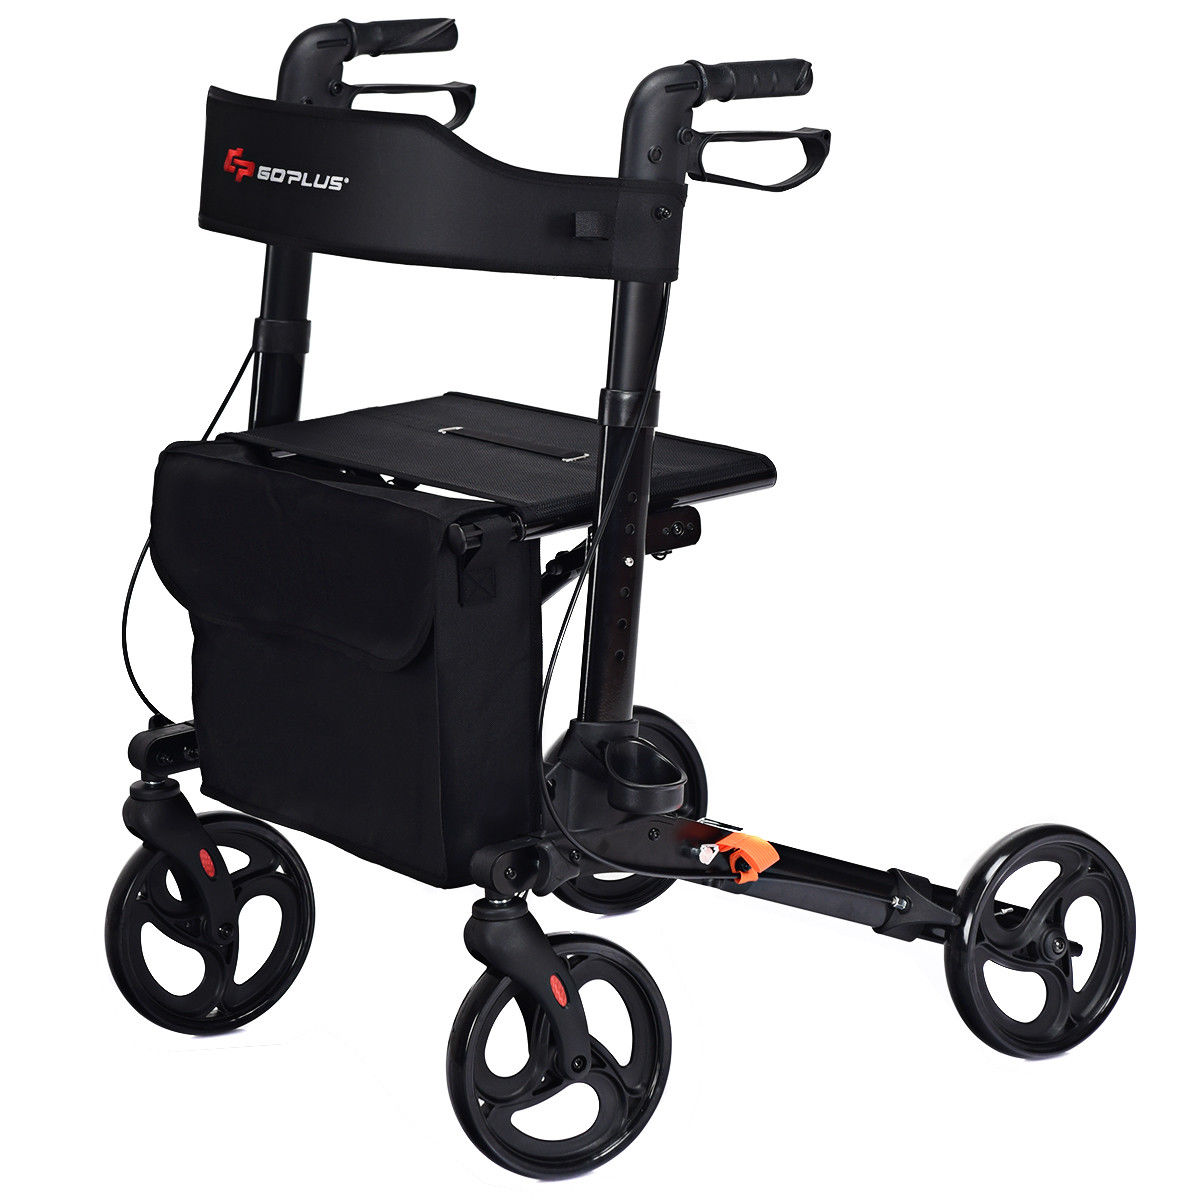 Goplus Folding Medical Rollator Lightweight Aluminum Walker Seniors w Adjustable Handle